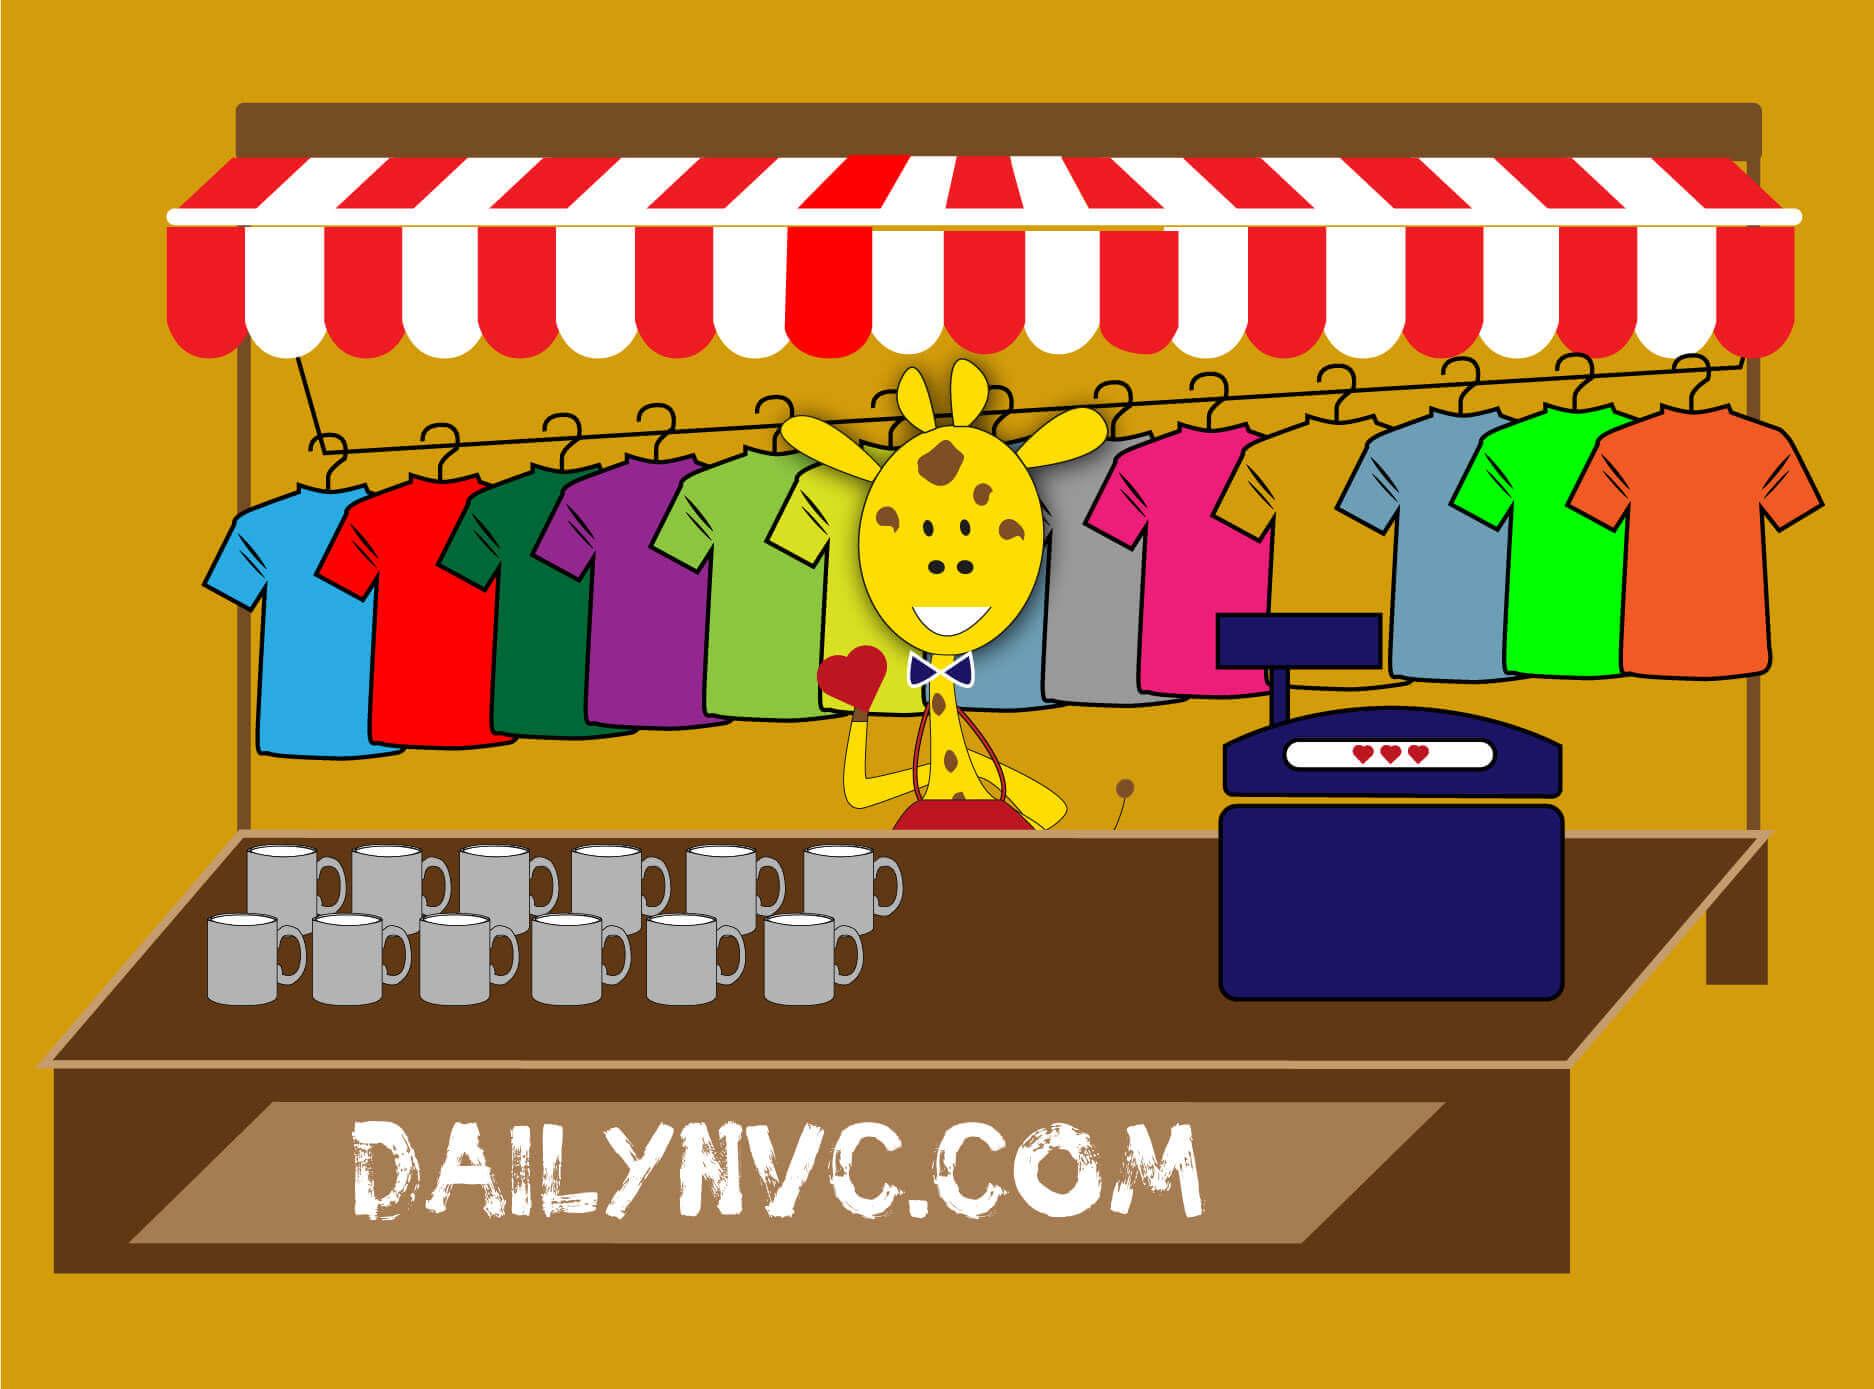 Shop | Daily NVC